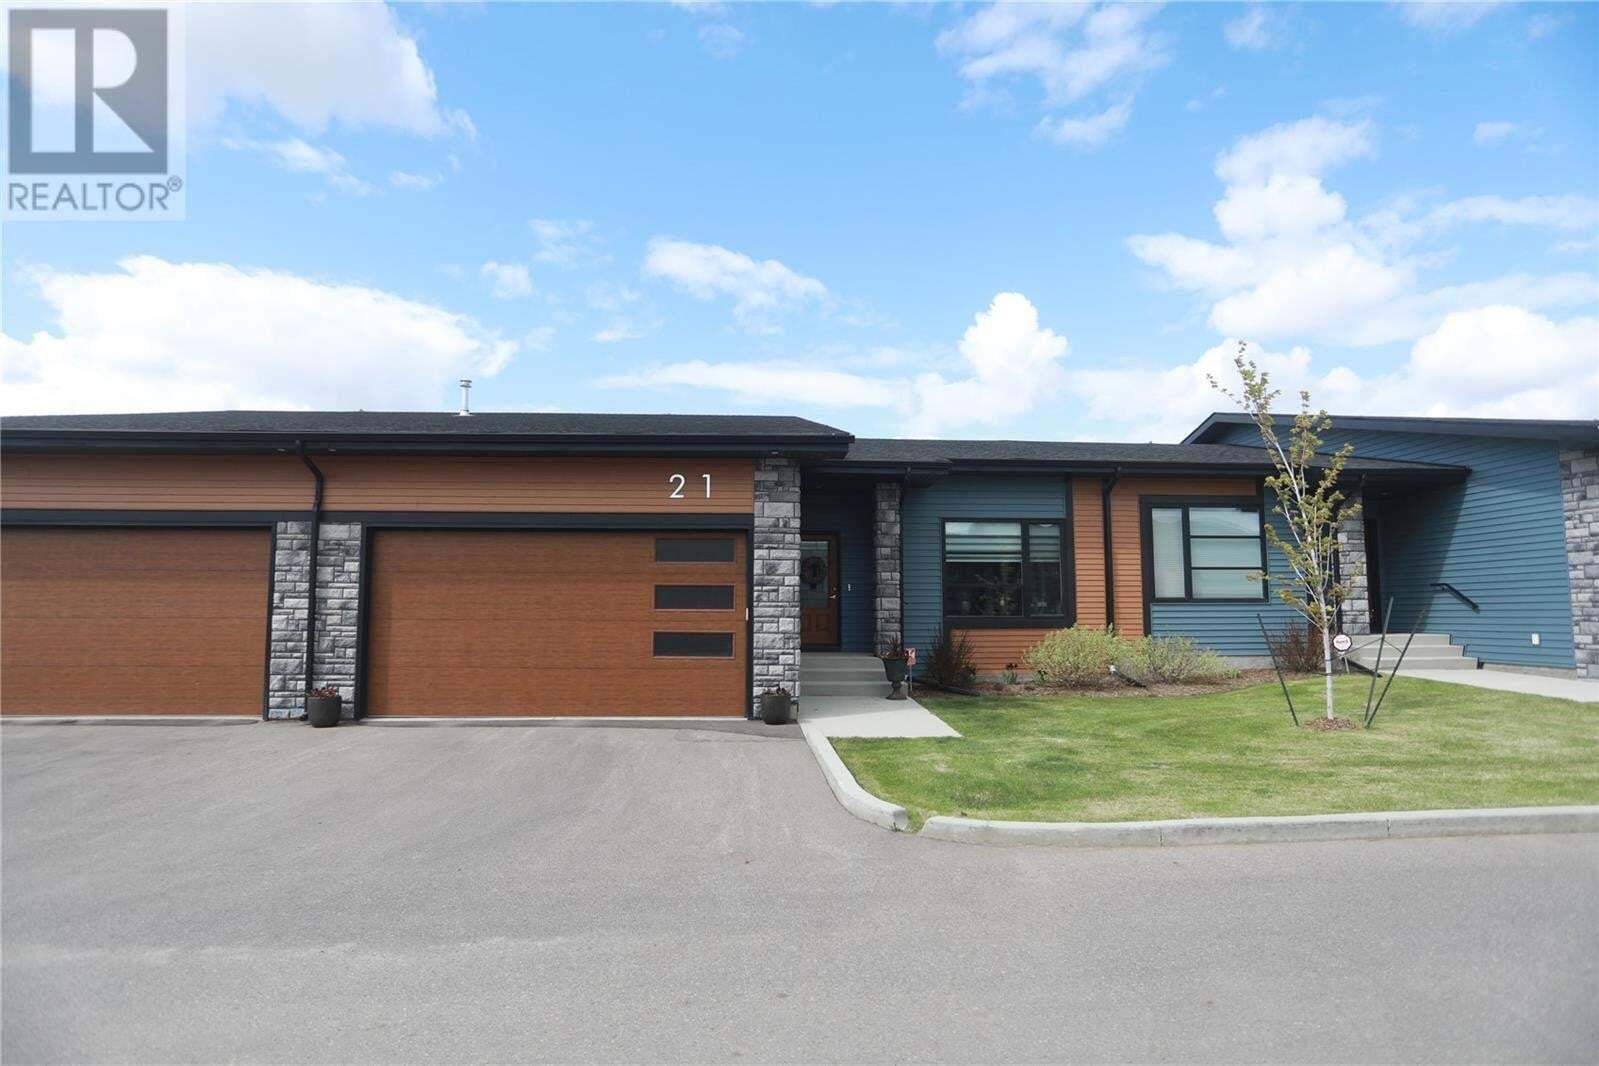 Townhouse for sale at 103 Pohorecky Cres Unit 21 Saskatoon Saskatchewan - MLS: SK809888